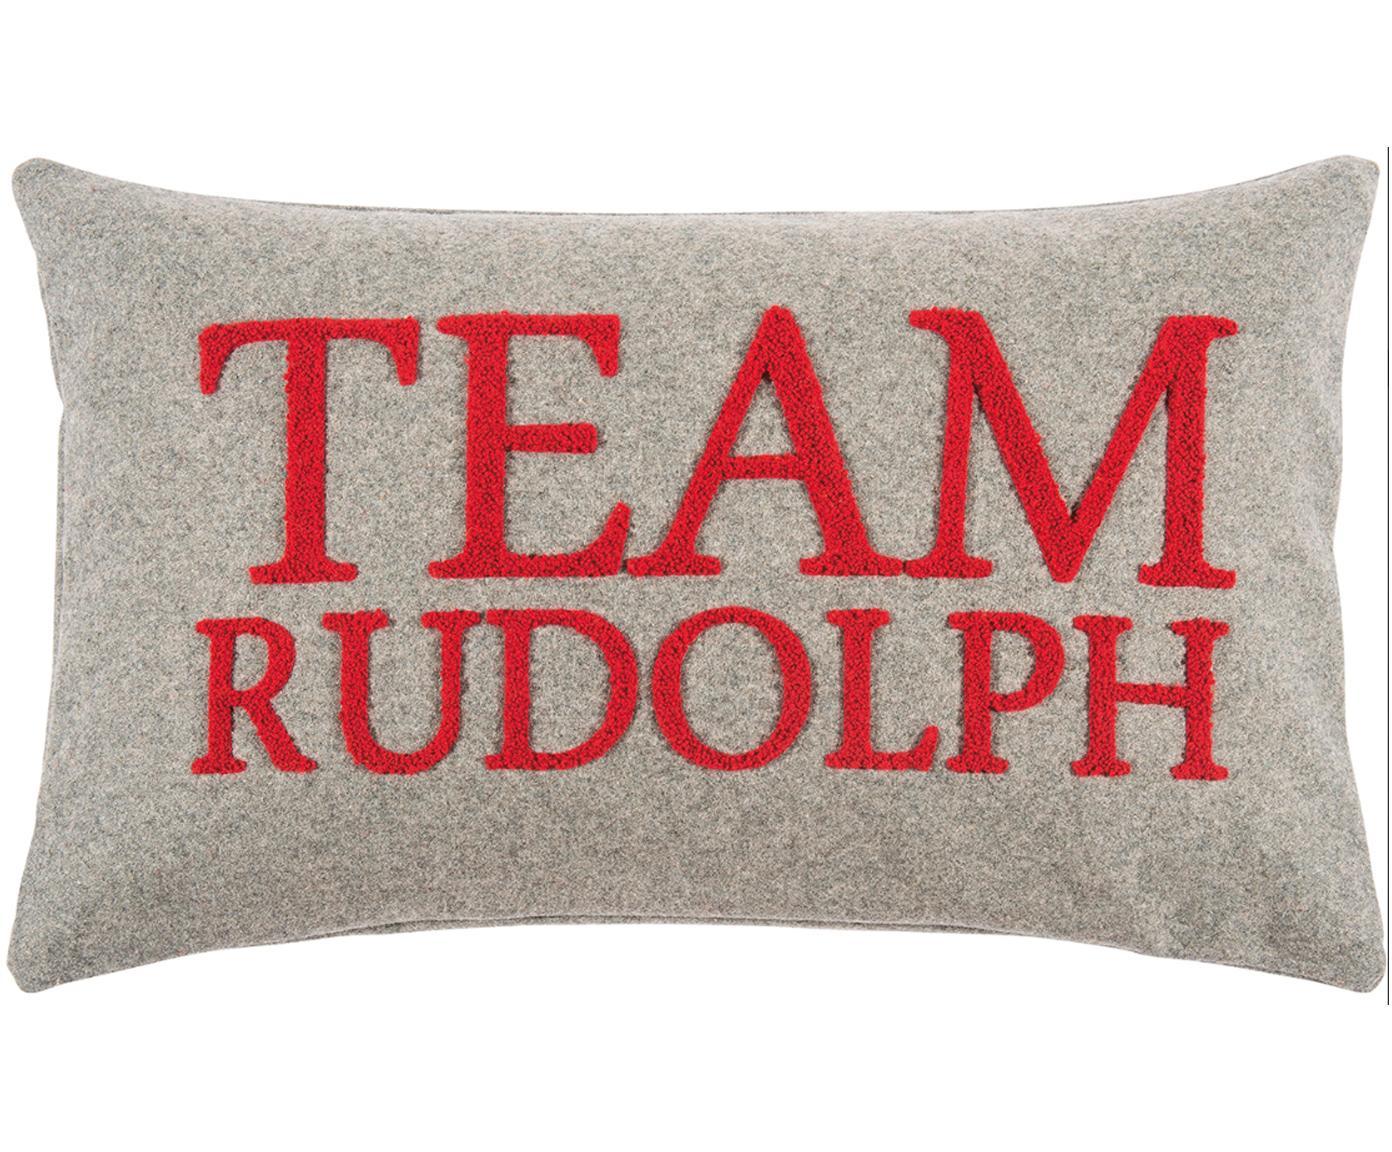 Federa arredo Rudolph, 60% lana, 40% poliestere, Grigio chiaro, rosso, Larg. 30 x Lung. 50 cm